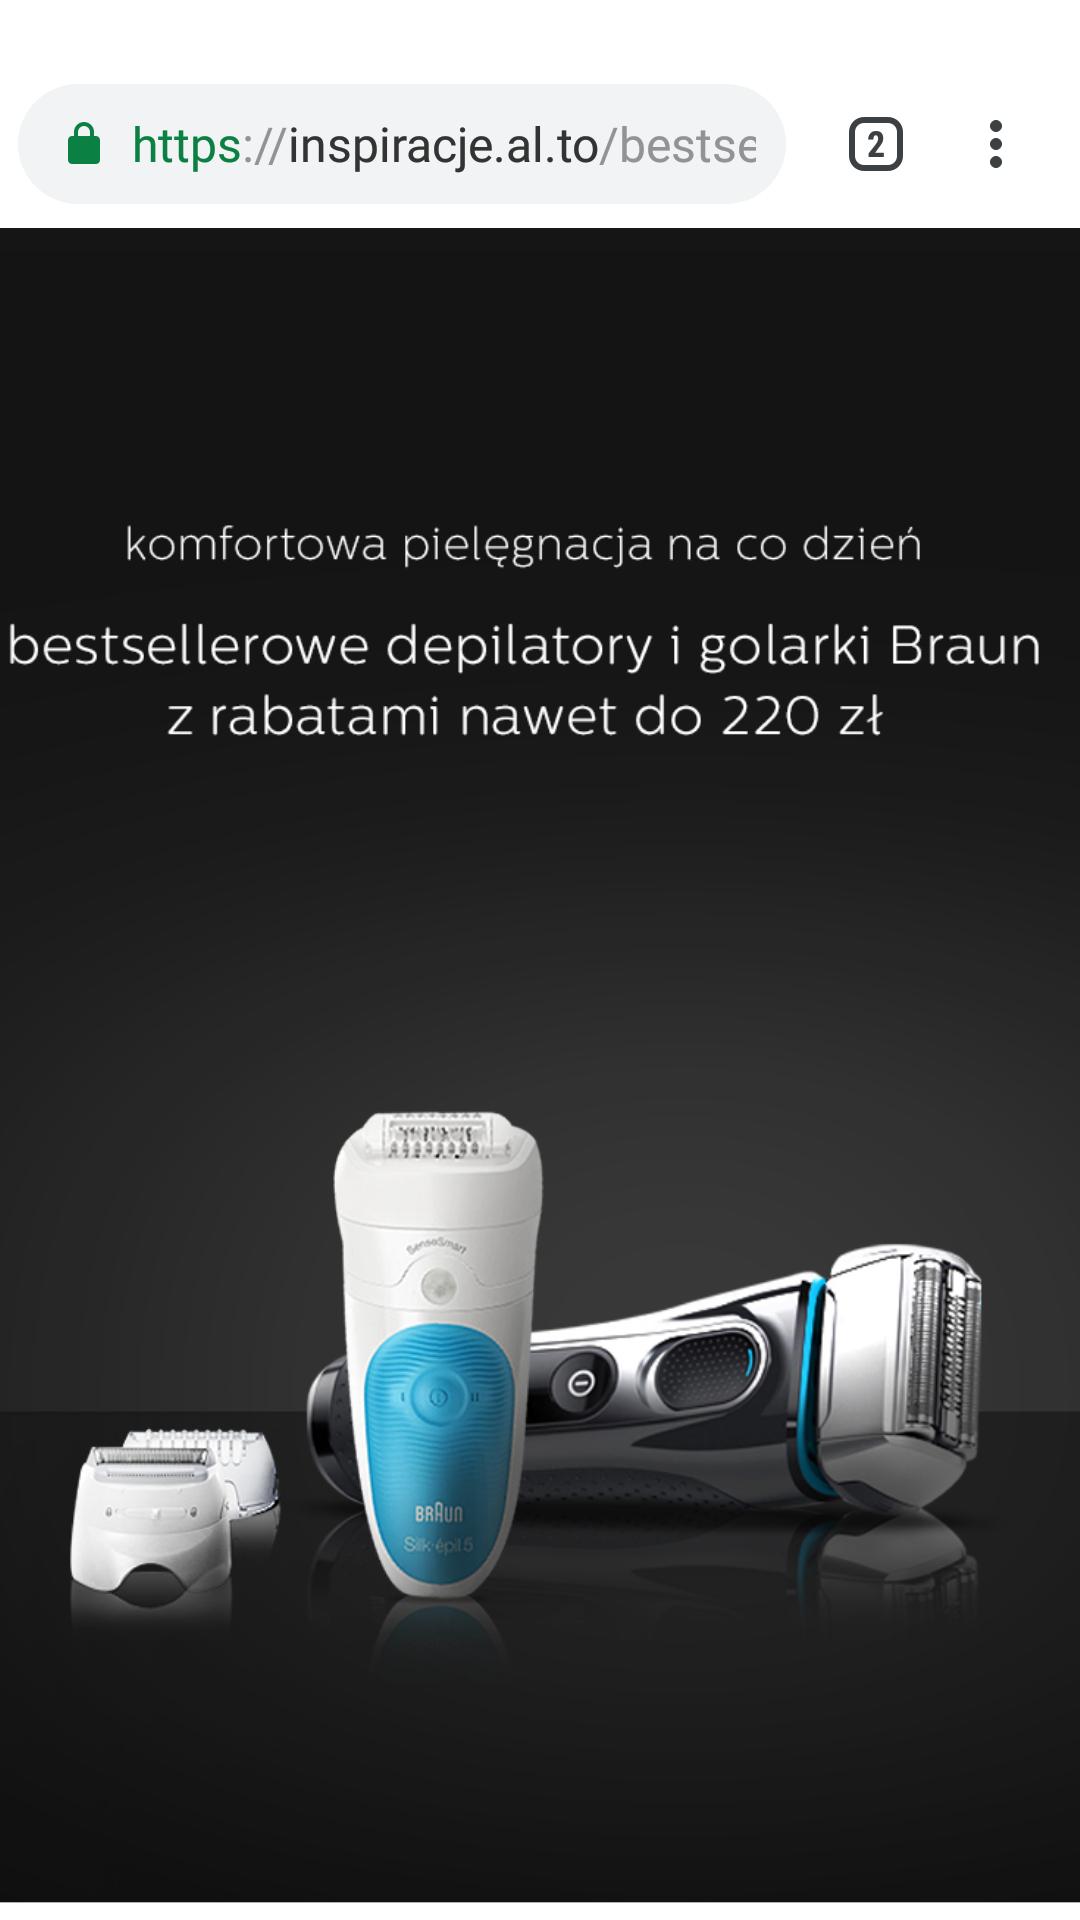 Promocja Braun depilatory i golarki